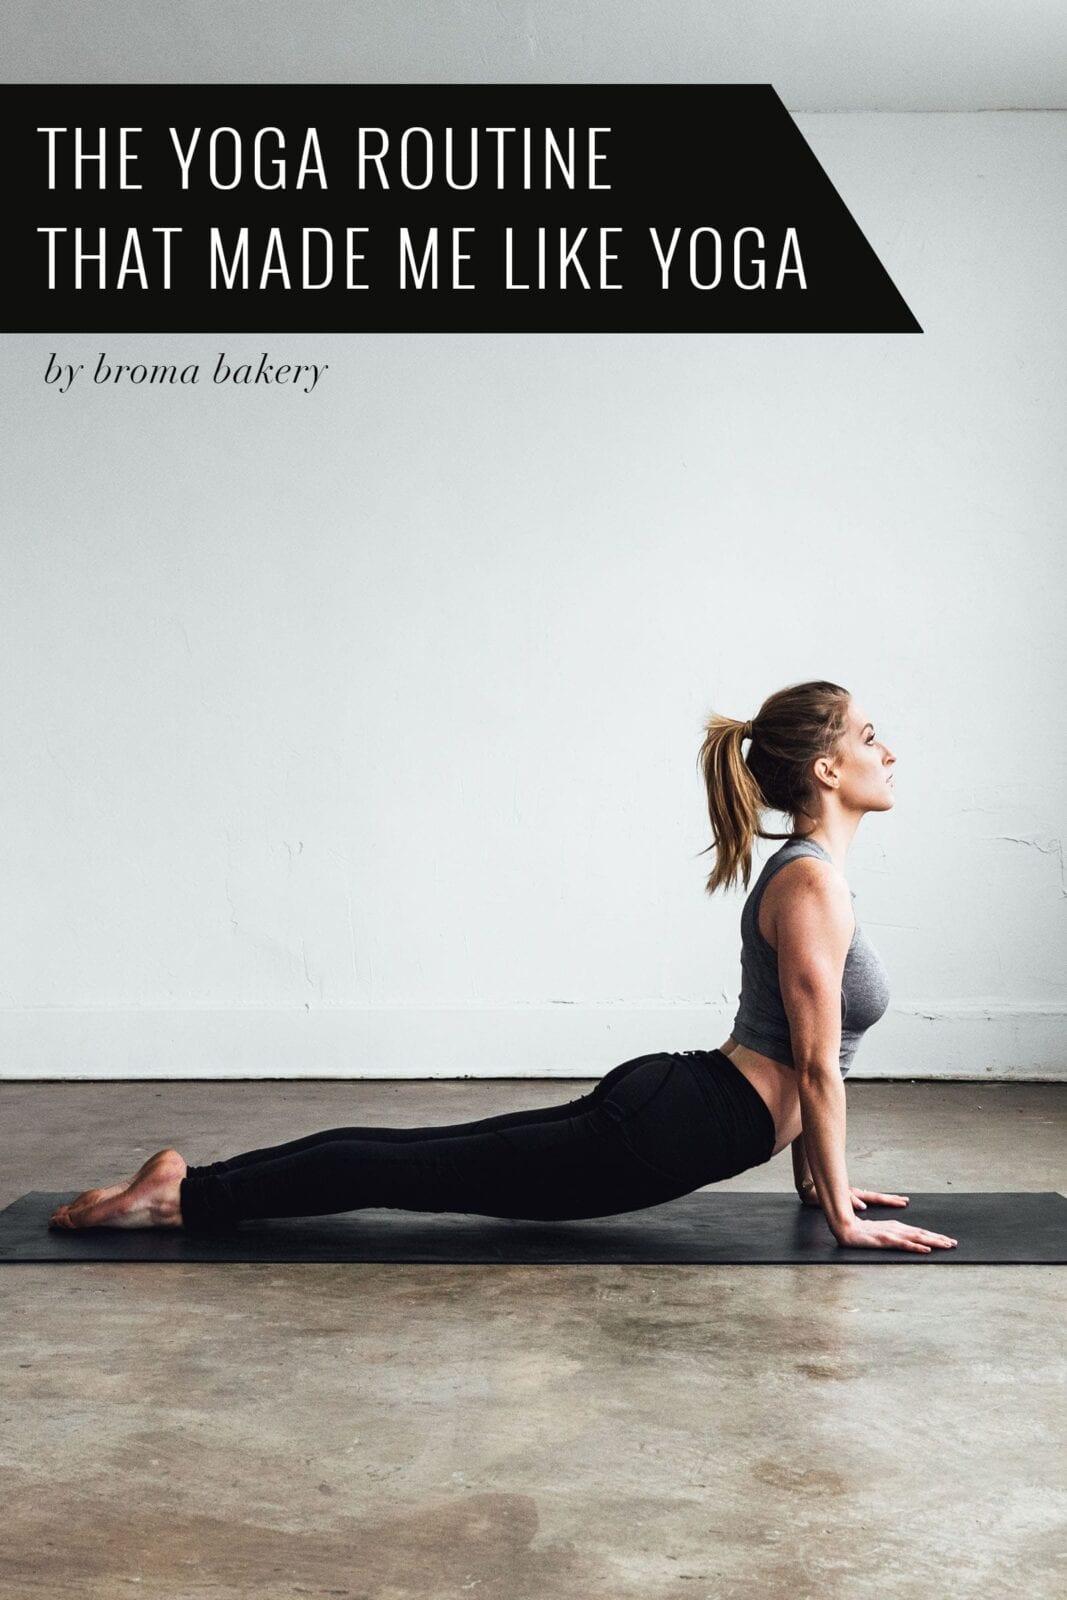 Morning yoga hot girls The Yoga Routine That Made Me Like Yoga Broma Bakery